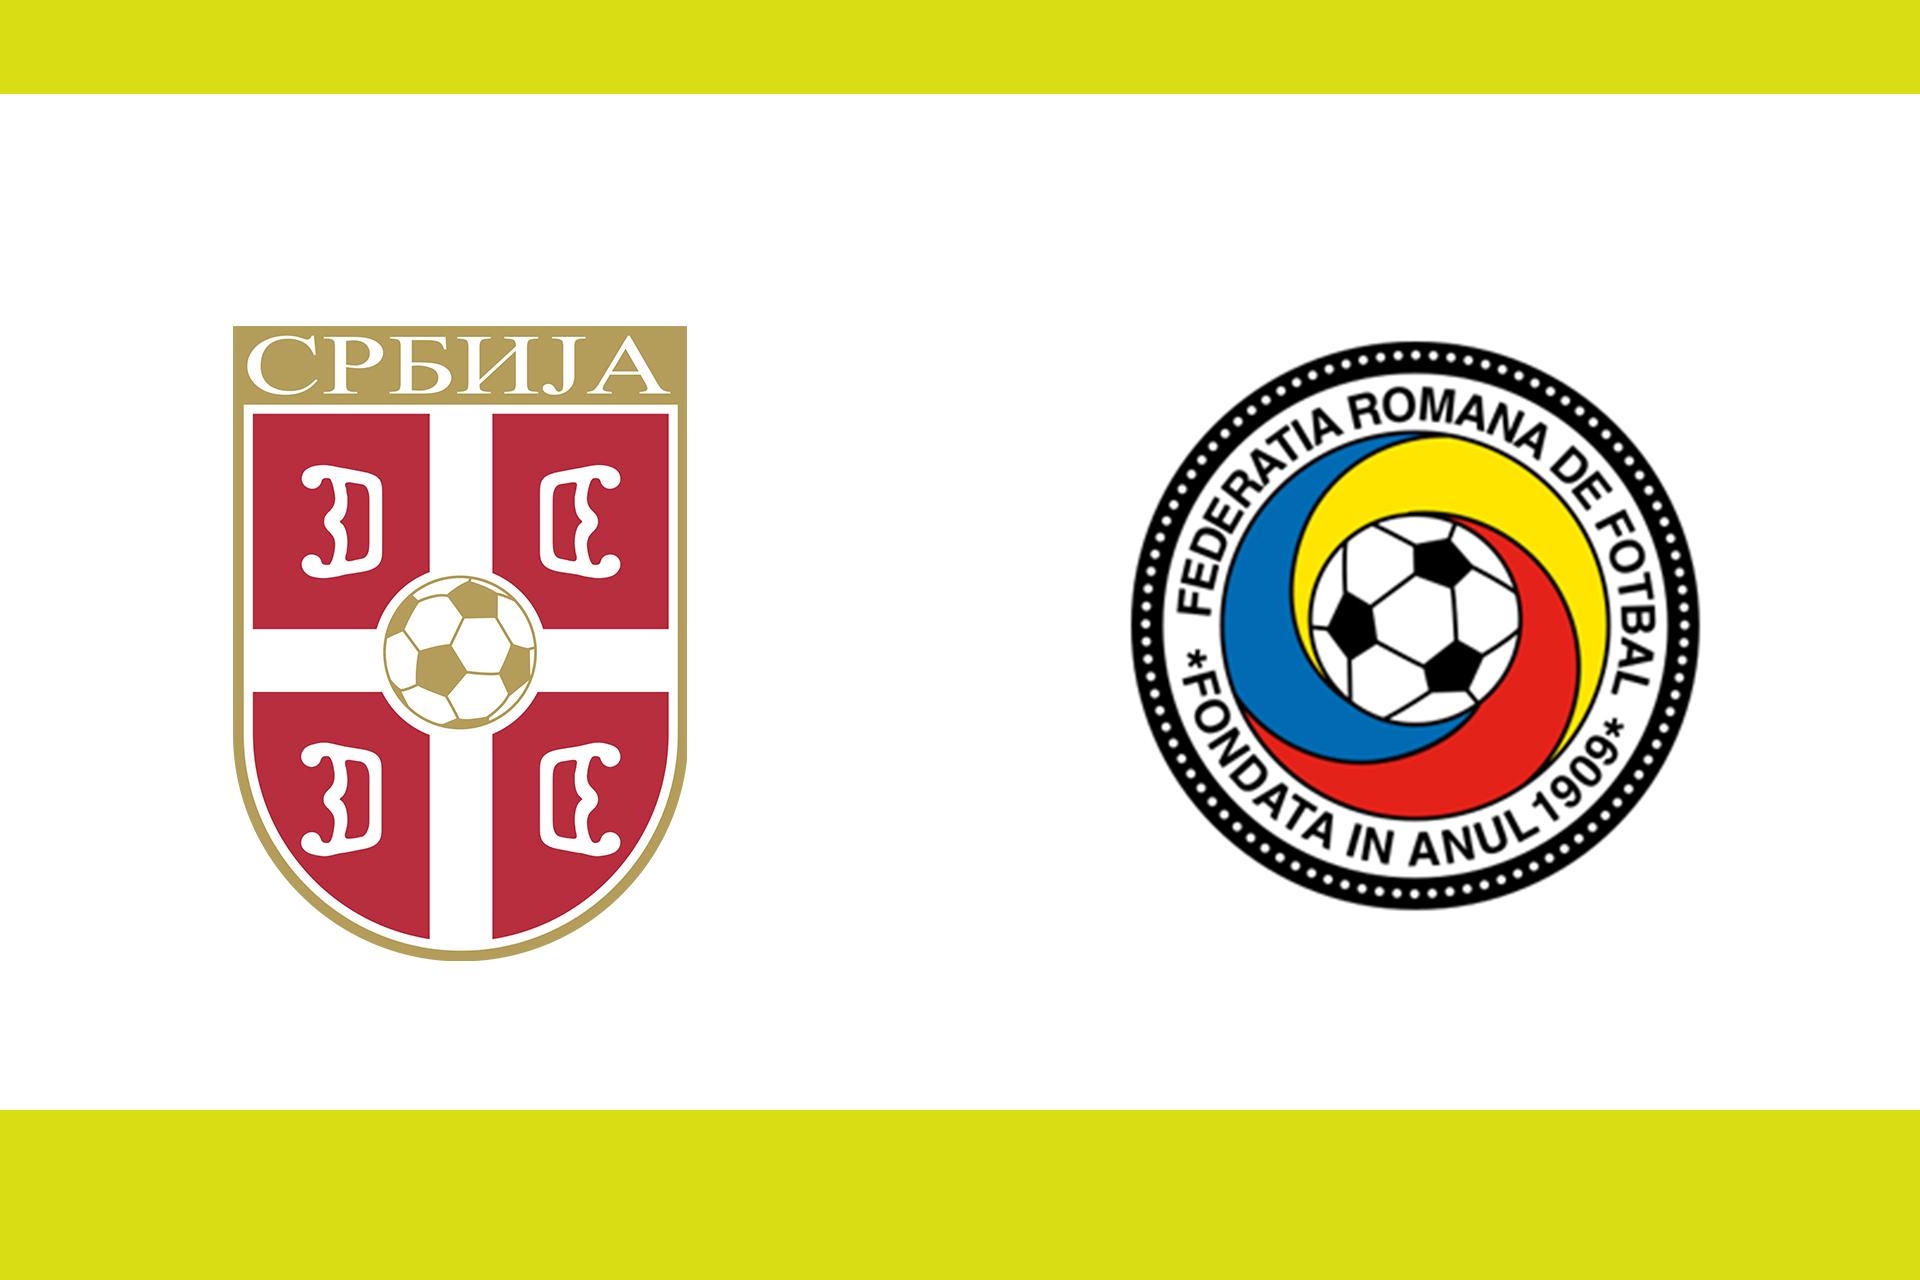 serbia-vs-romania-tip-bong-da-11-9-2018 1